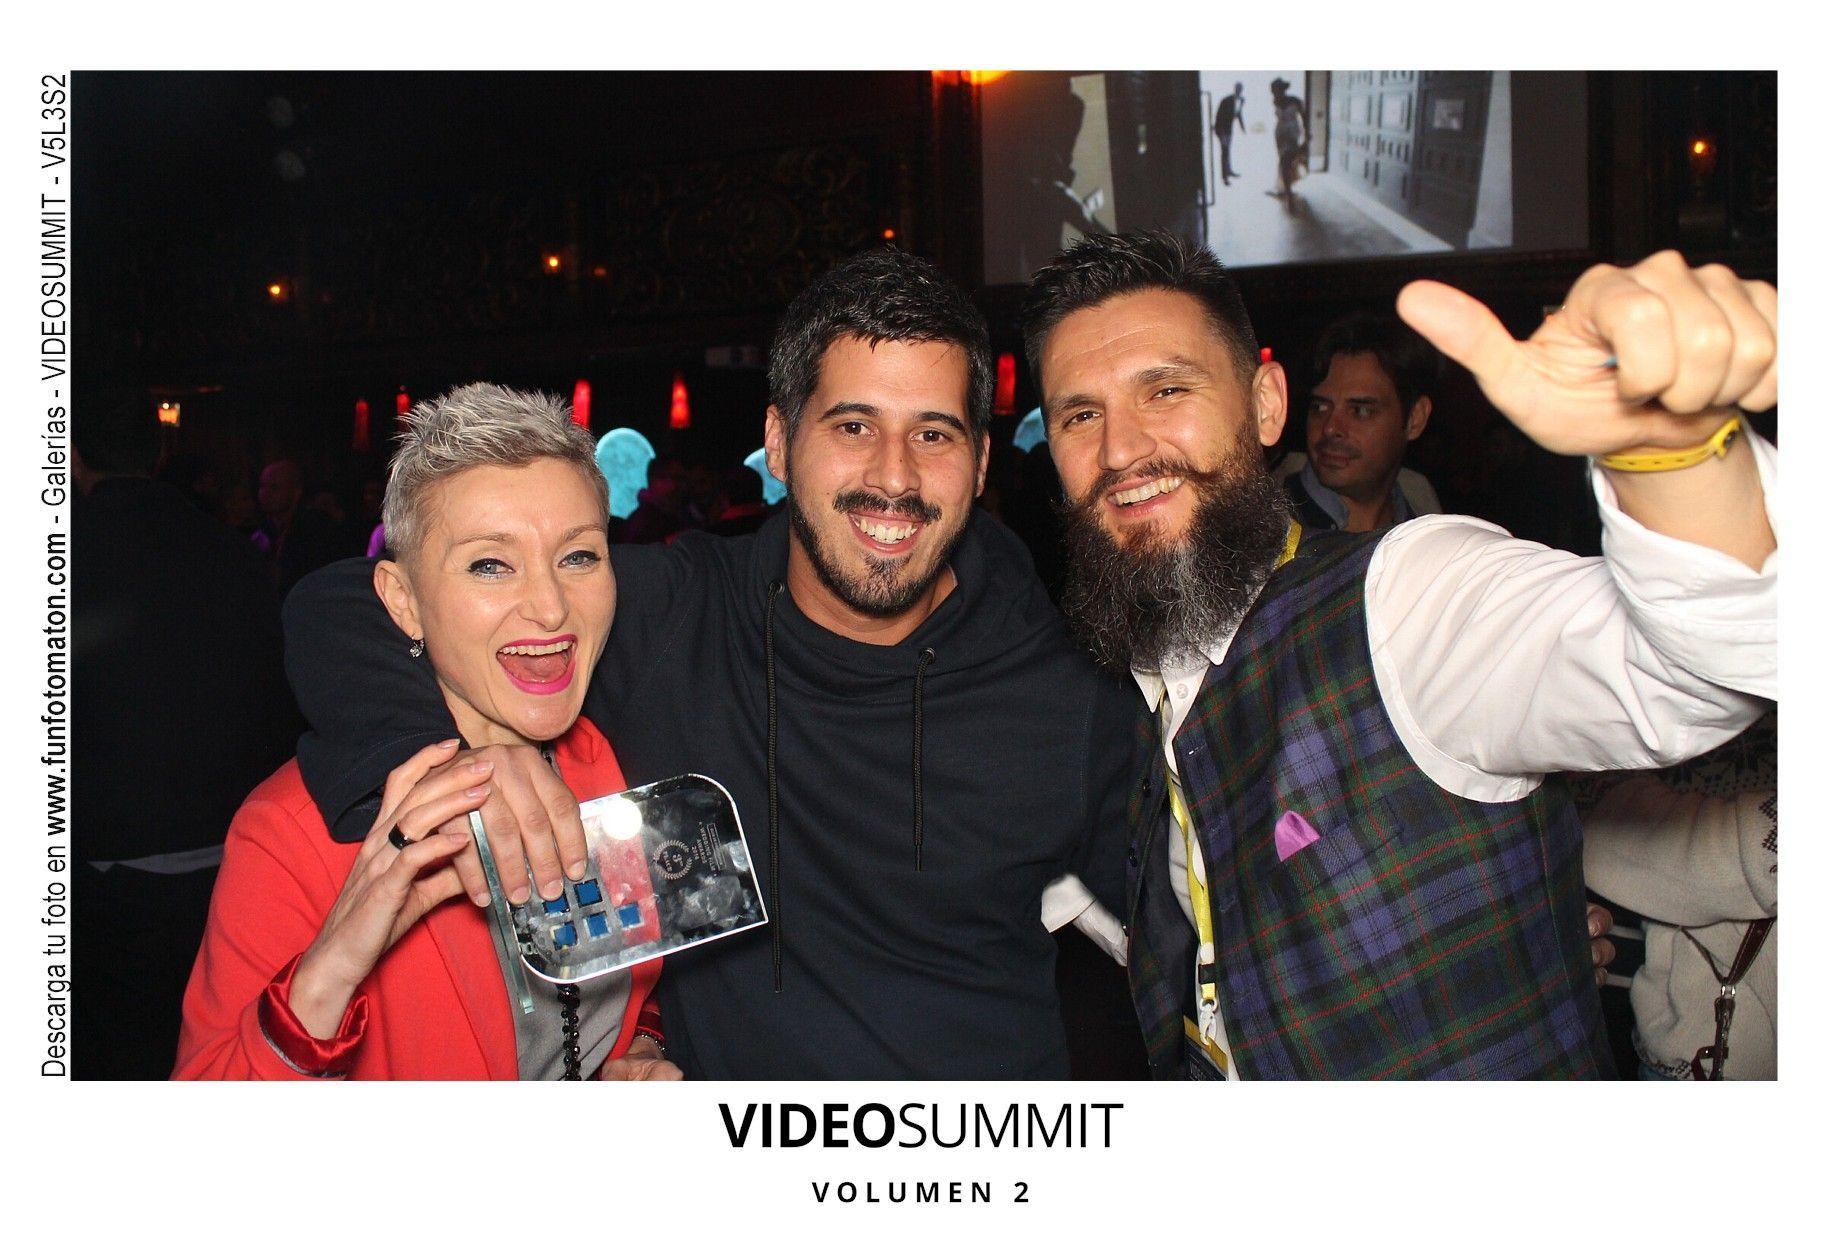 videosummit-vol2-club-party-032